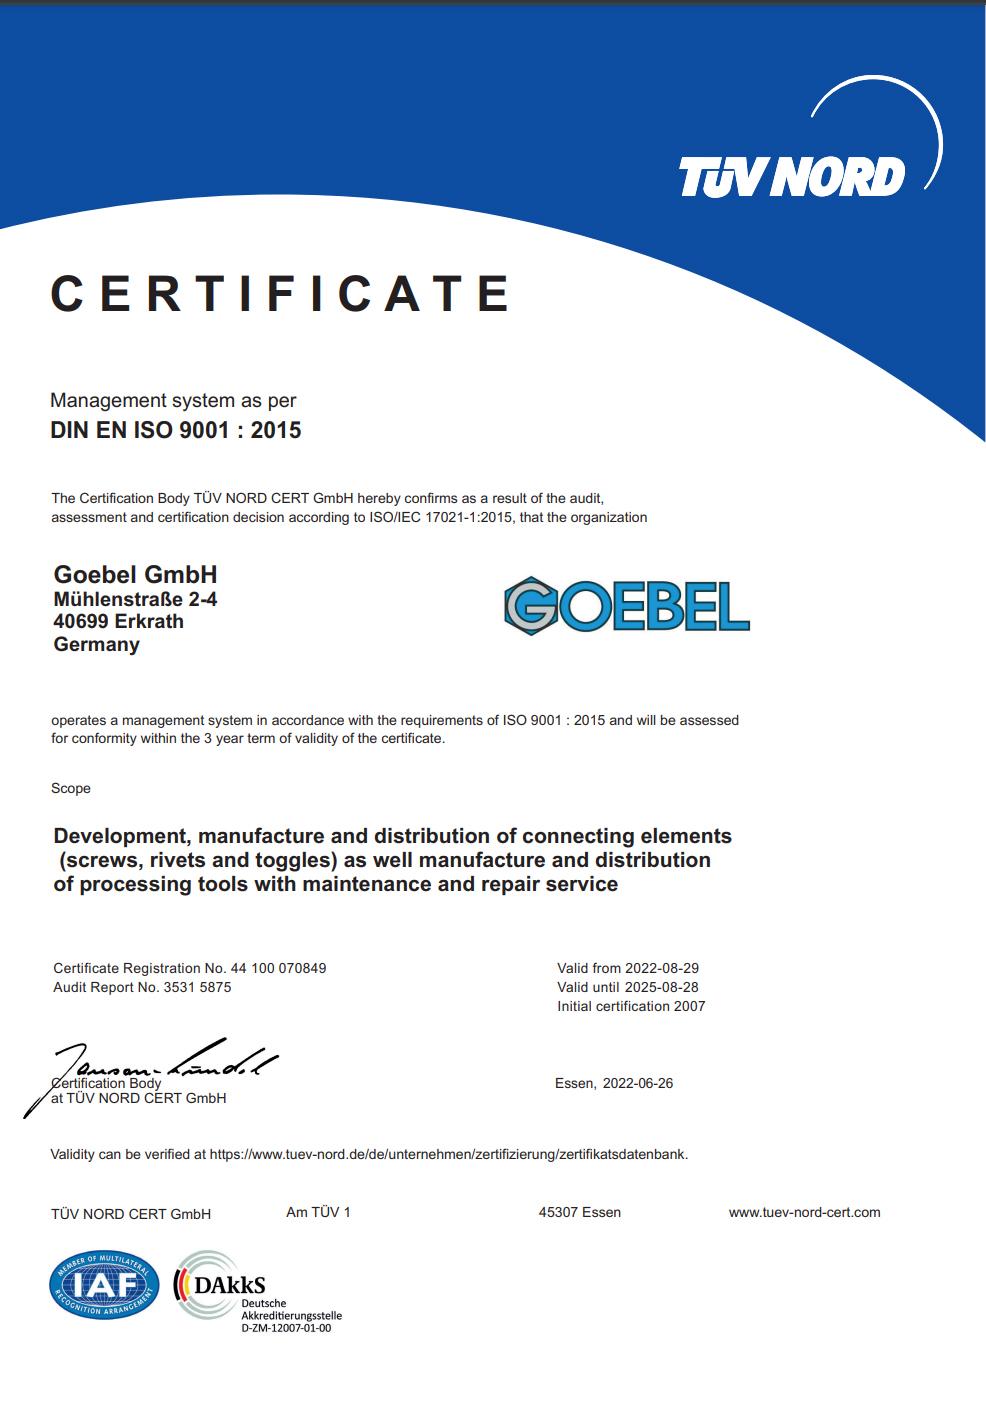 СЕРТИФИКАТ DIN EN ISO 9001 : 2015 TUV NORD